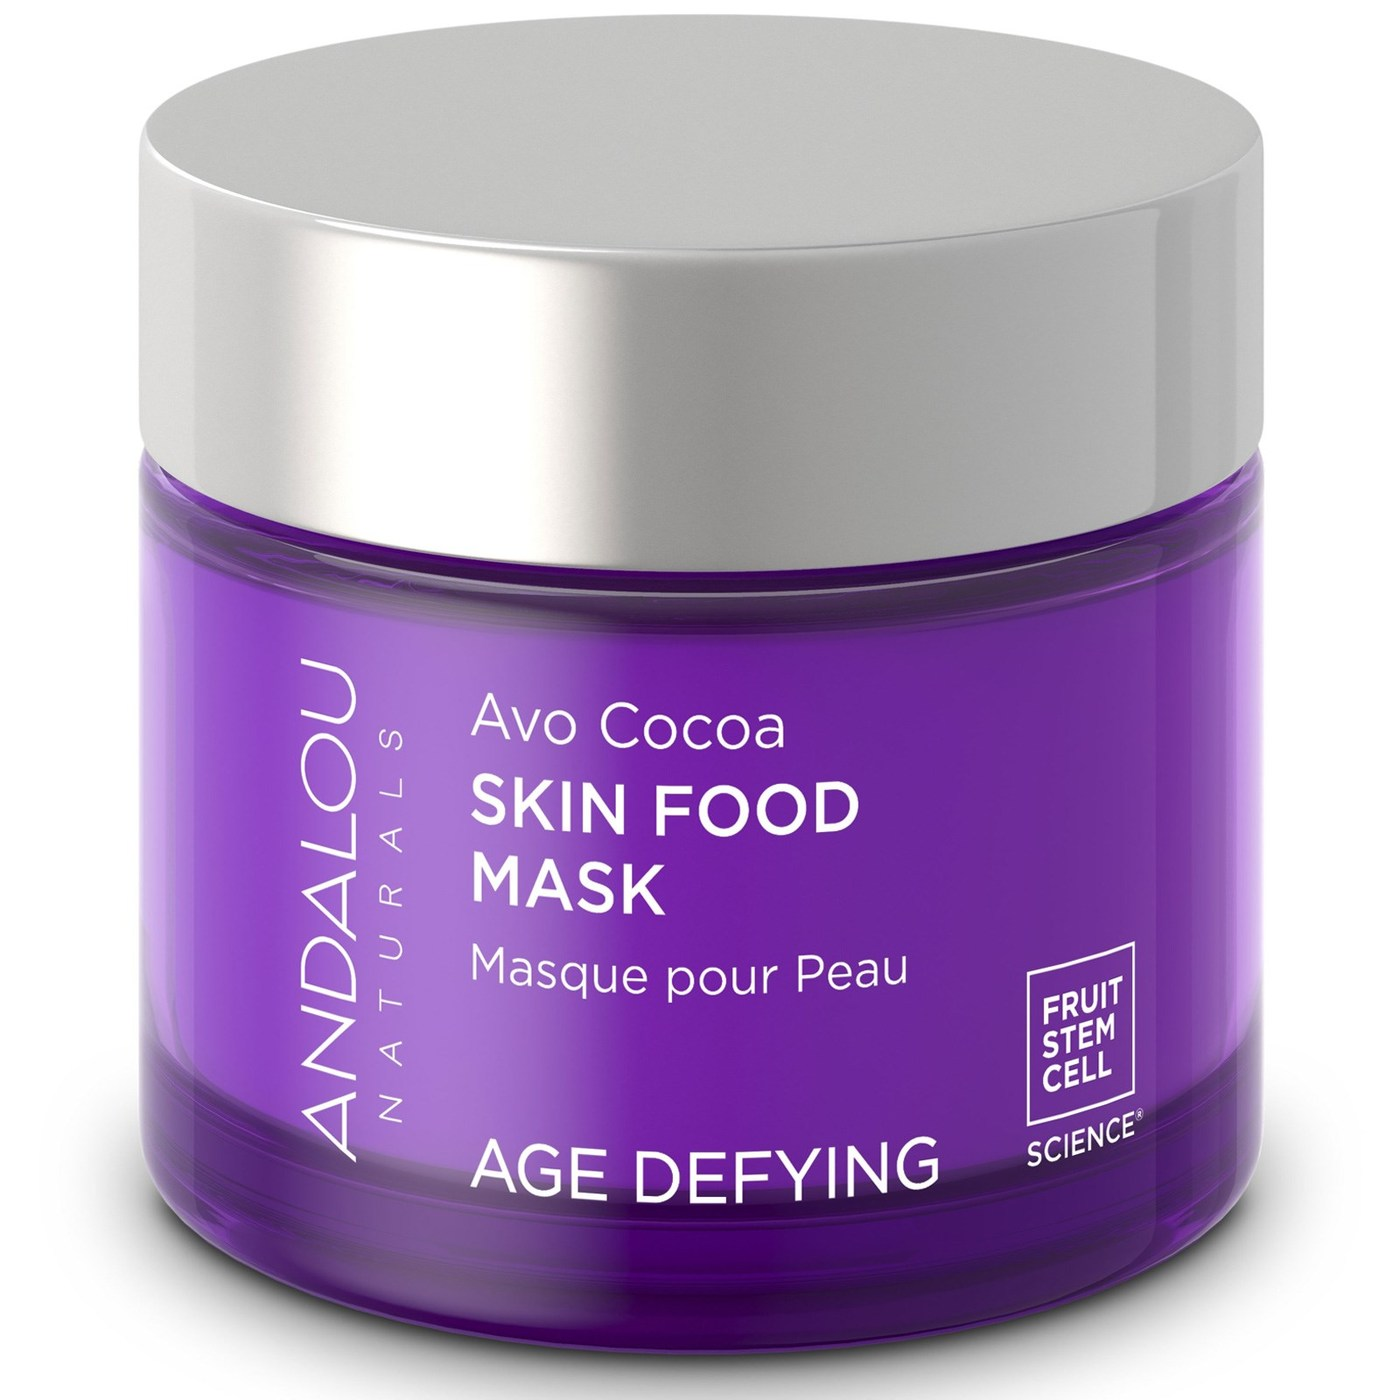 Andalou Naturals Avo Cocoa Mask Review